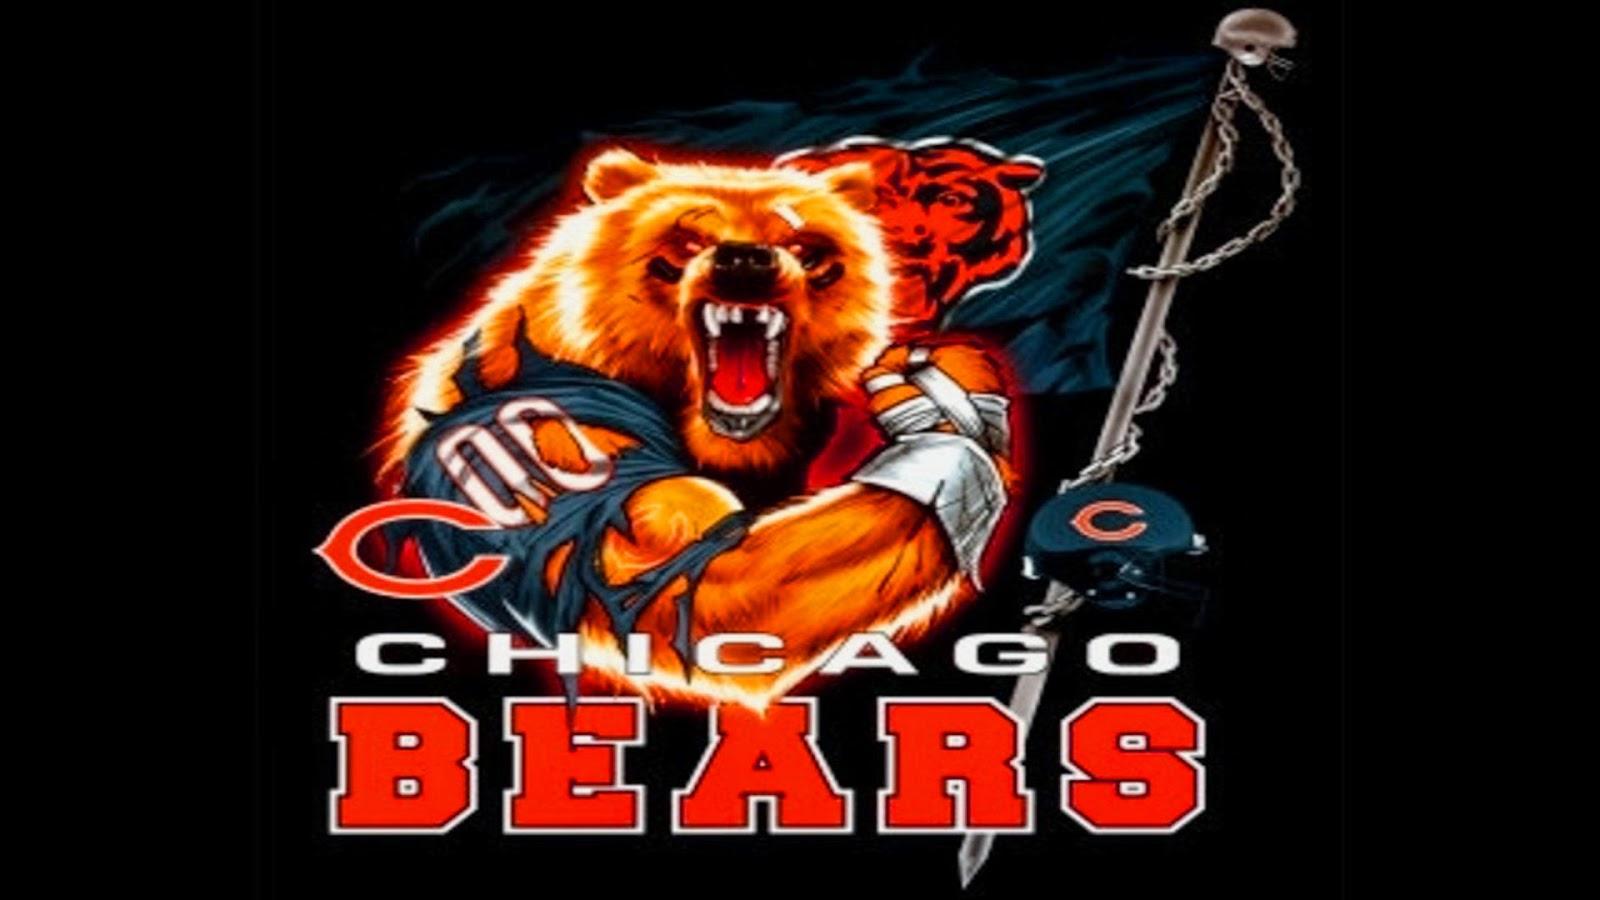 chicago bears football hd wallpaper hd wallpaper movie